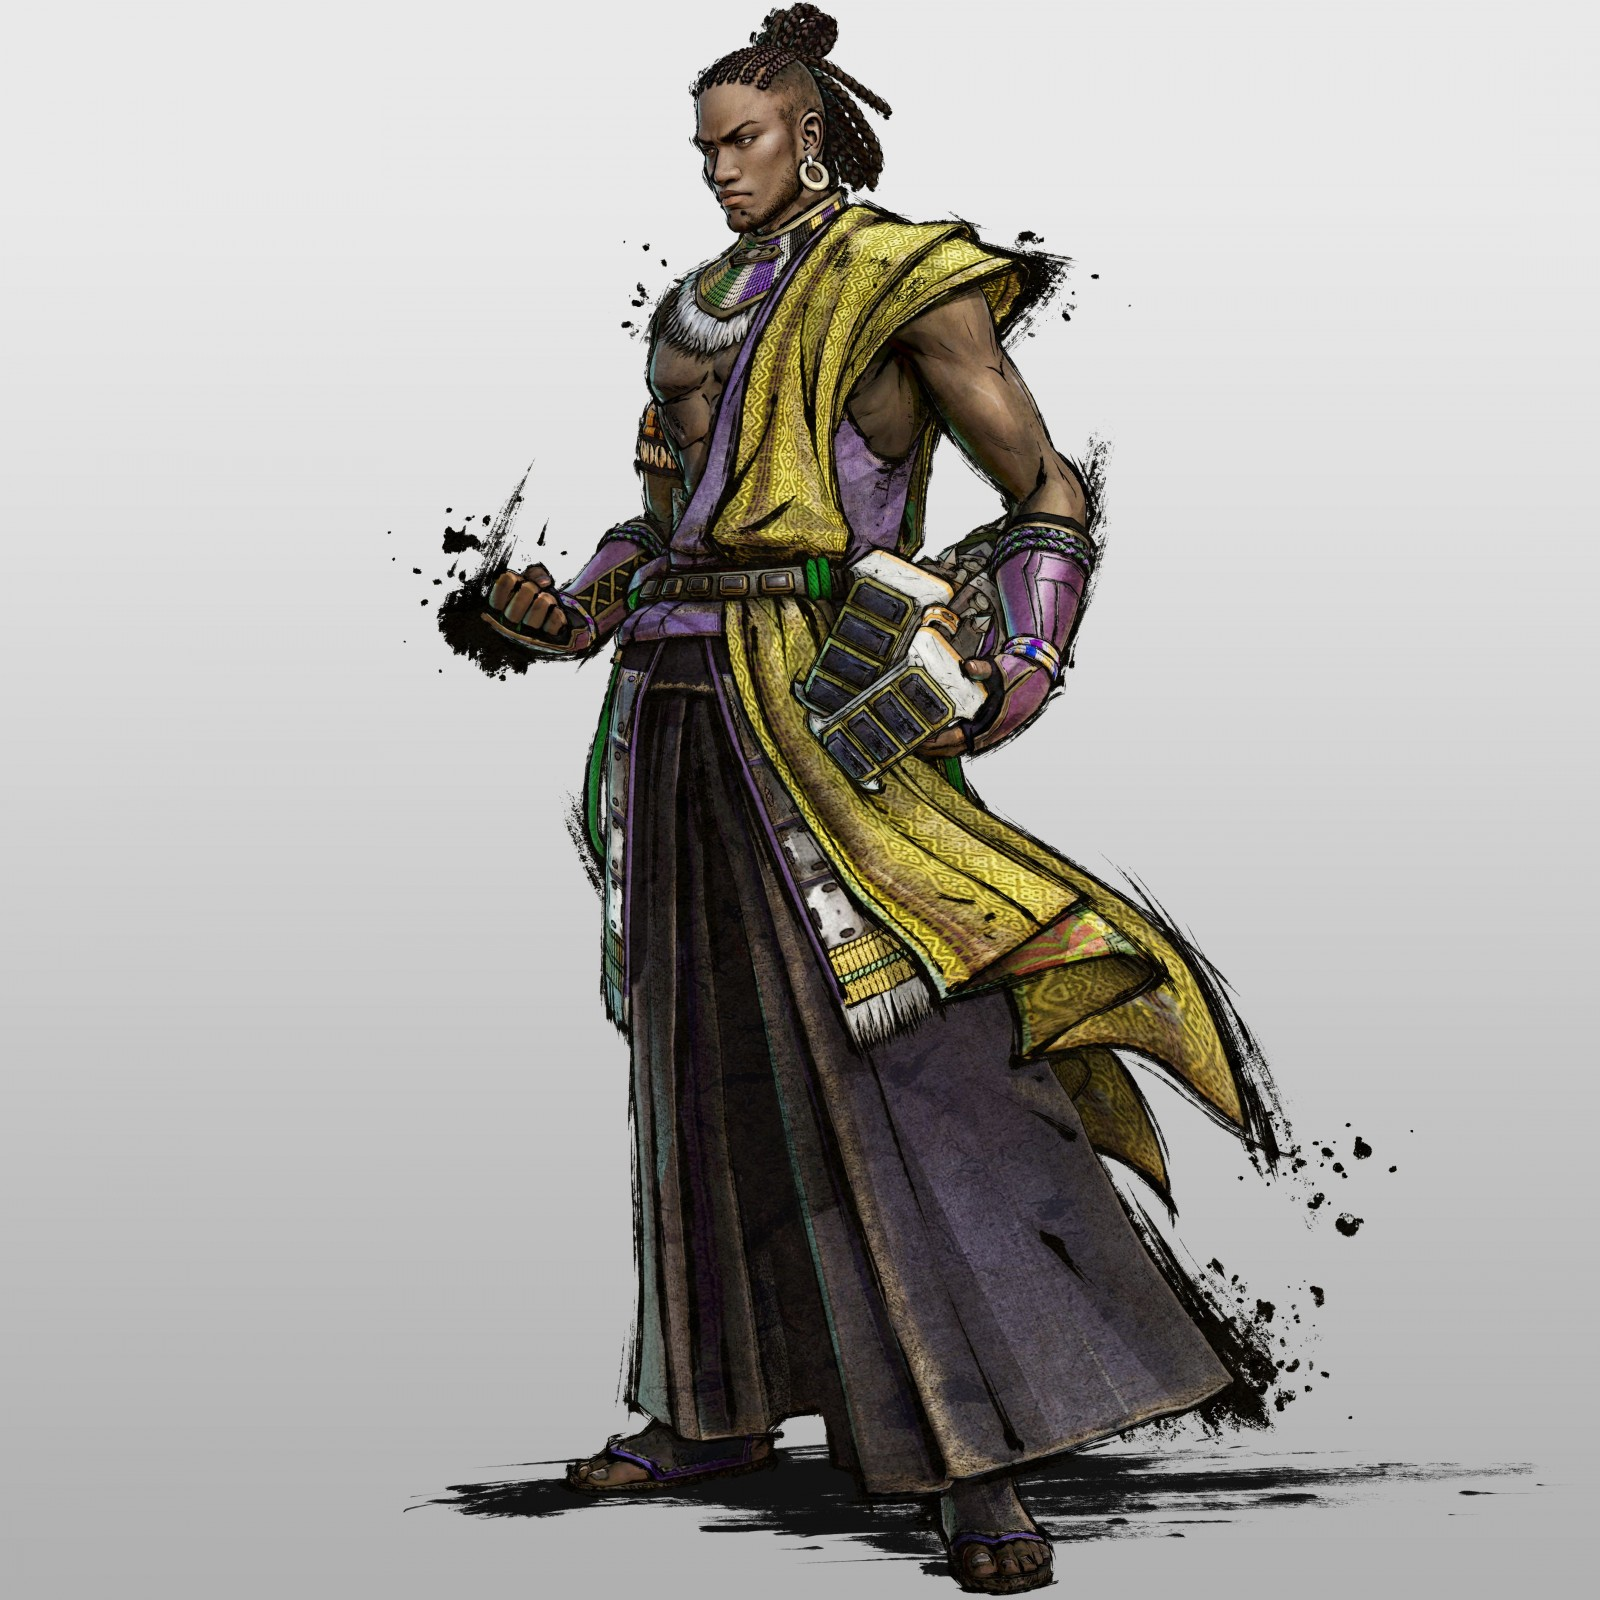 Reseña: Samurai Warriors 5 14